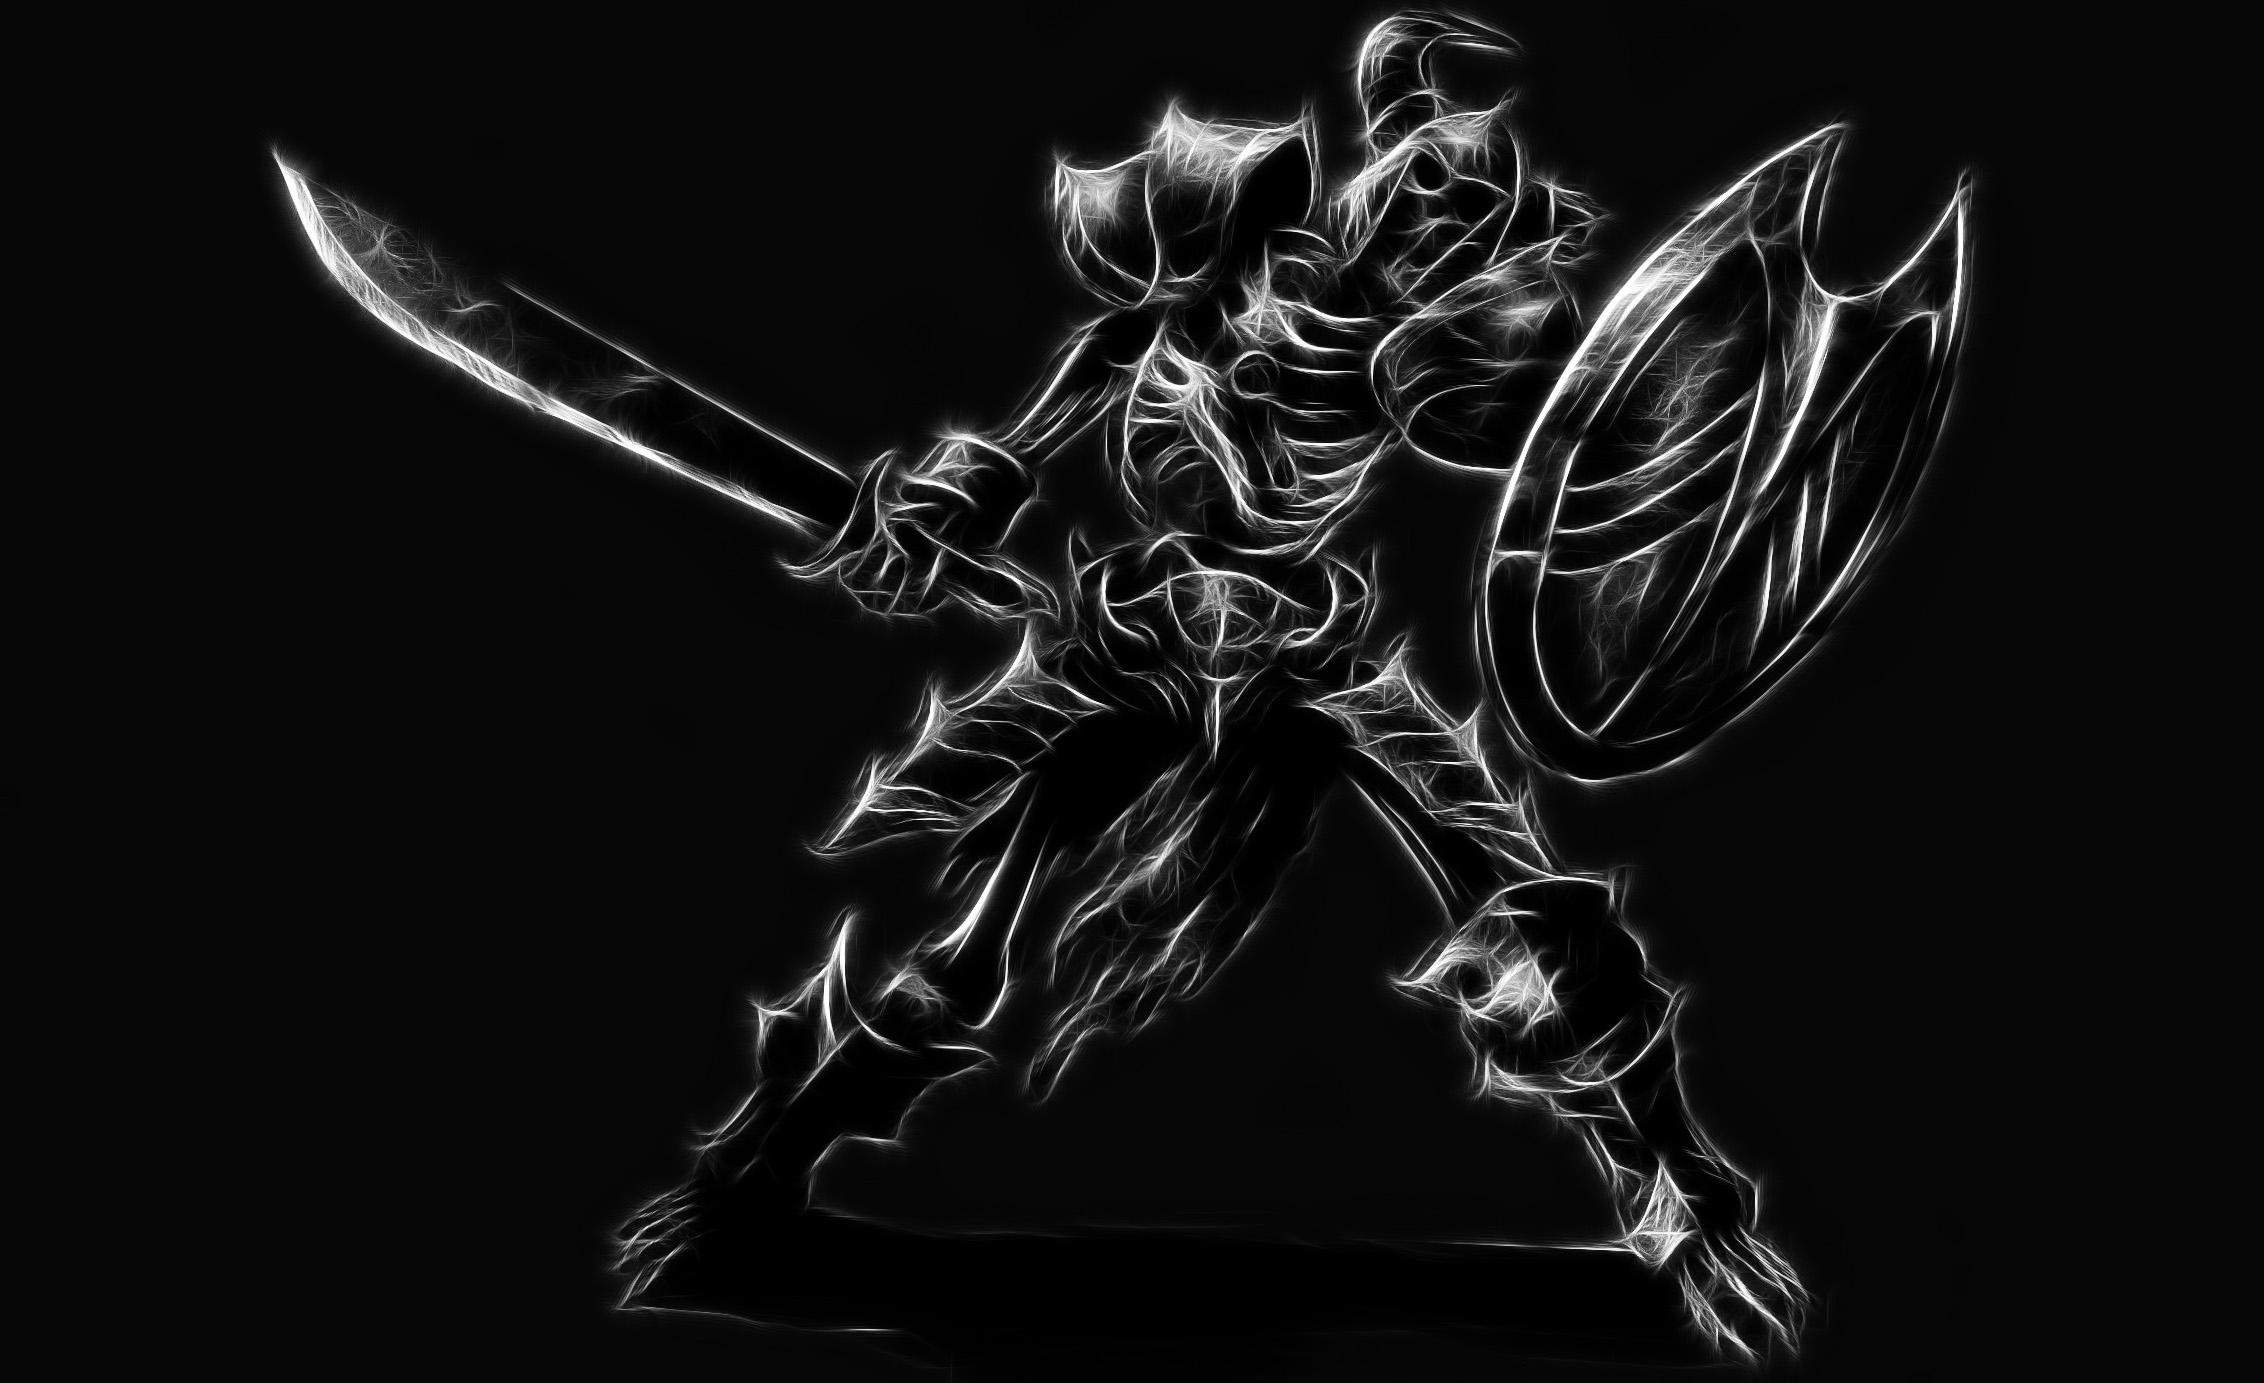 Warrior HD Wallpaper | Background Image | 2264x1383 | ID ...